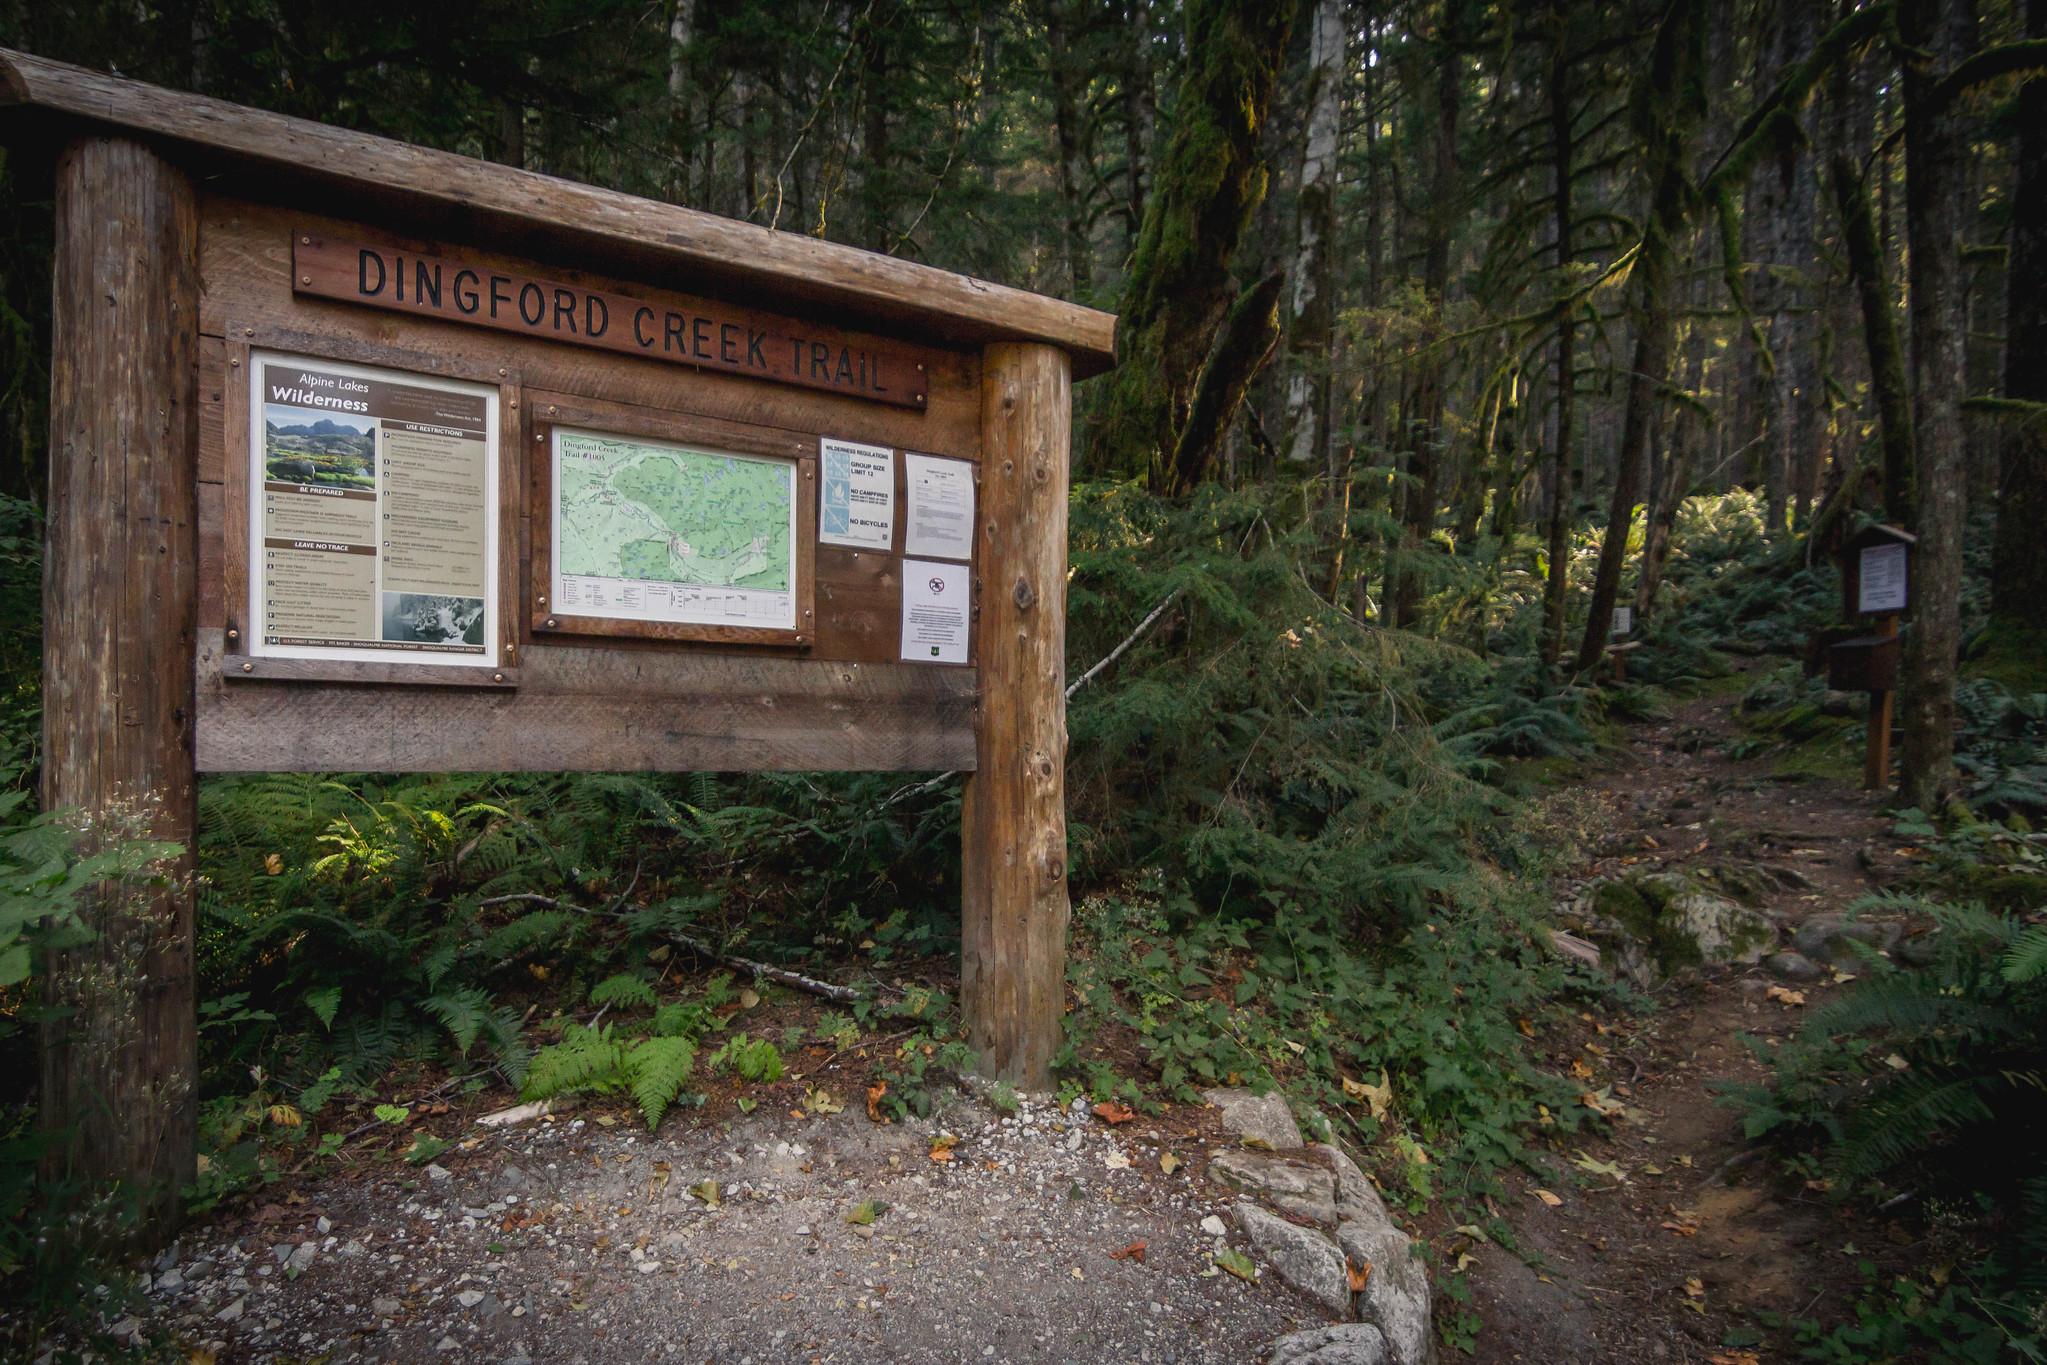 Dingford Creek Trailhead